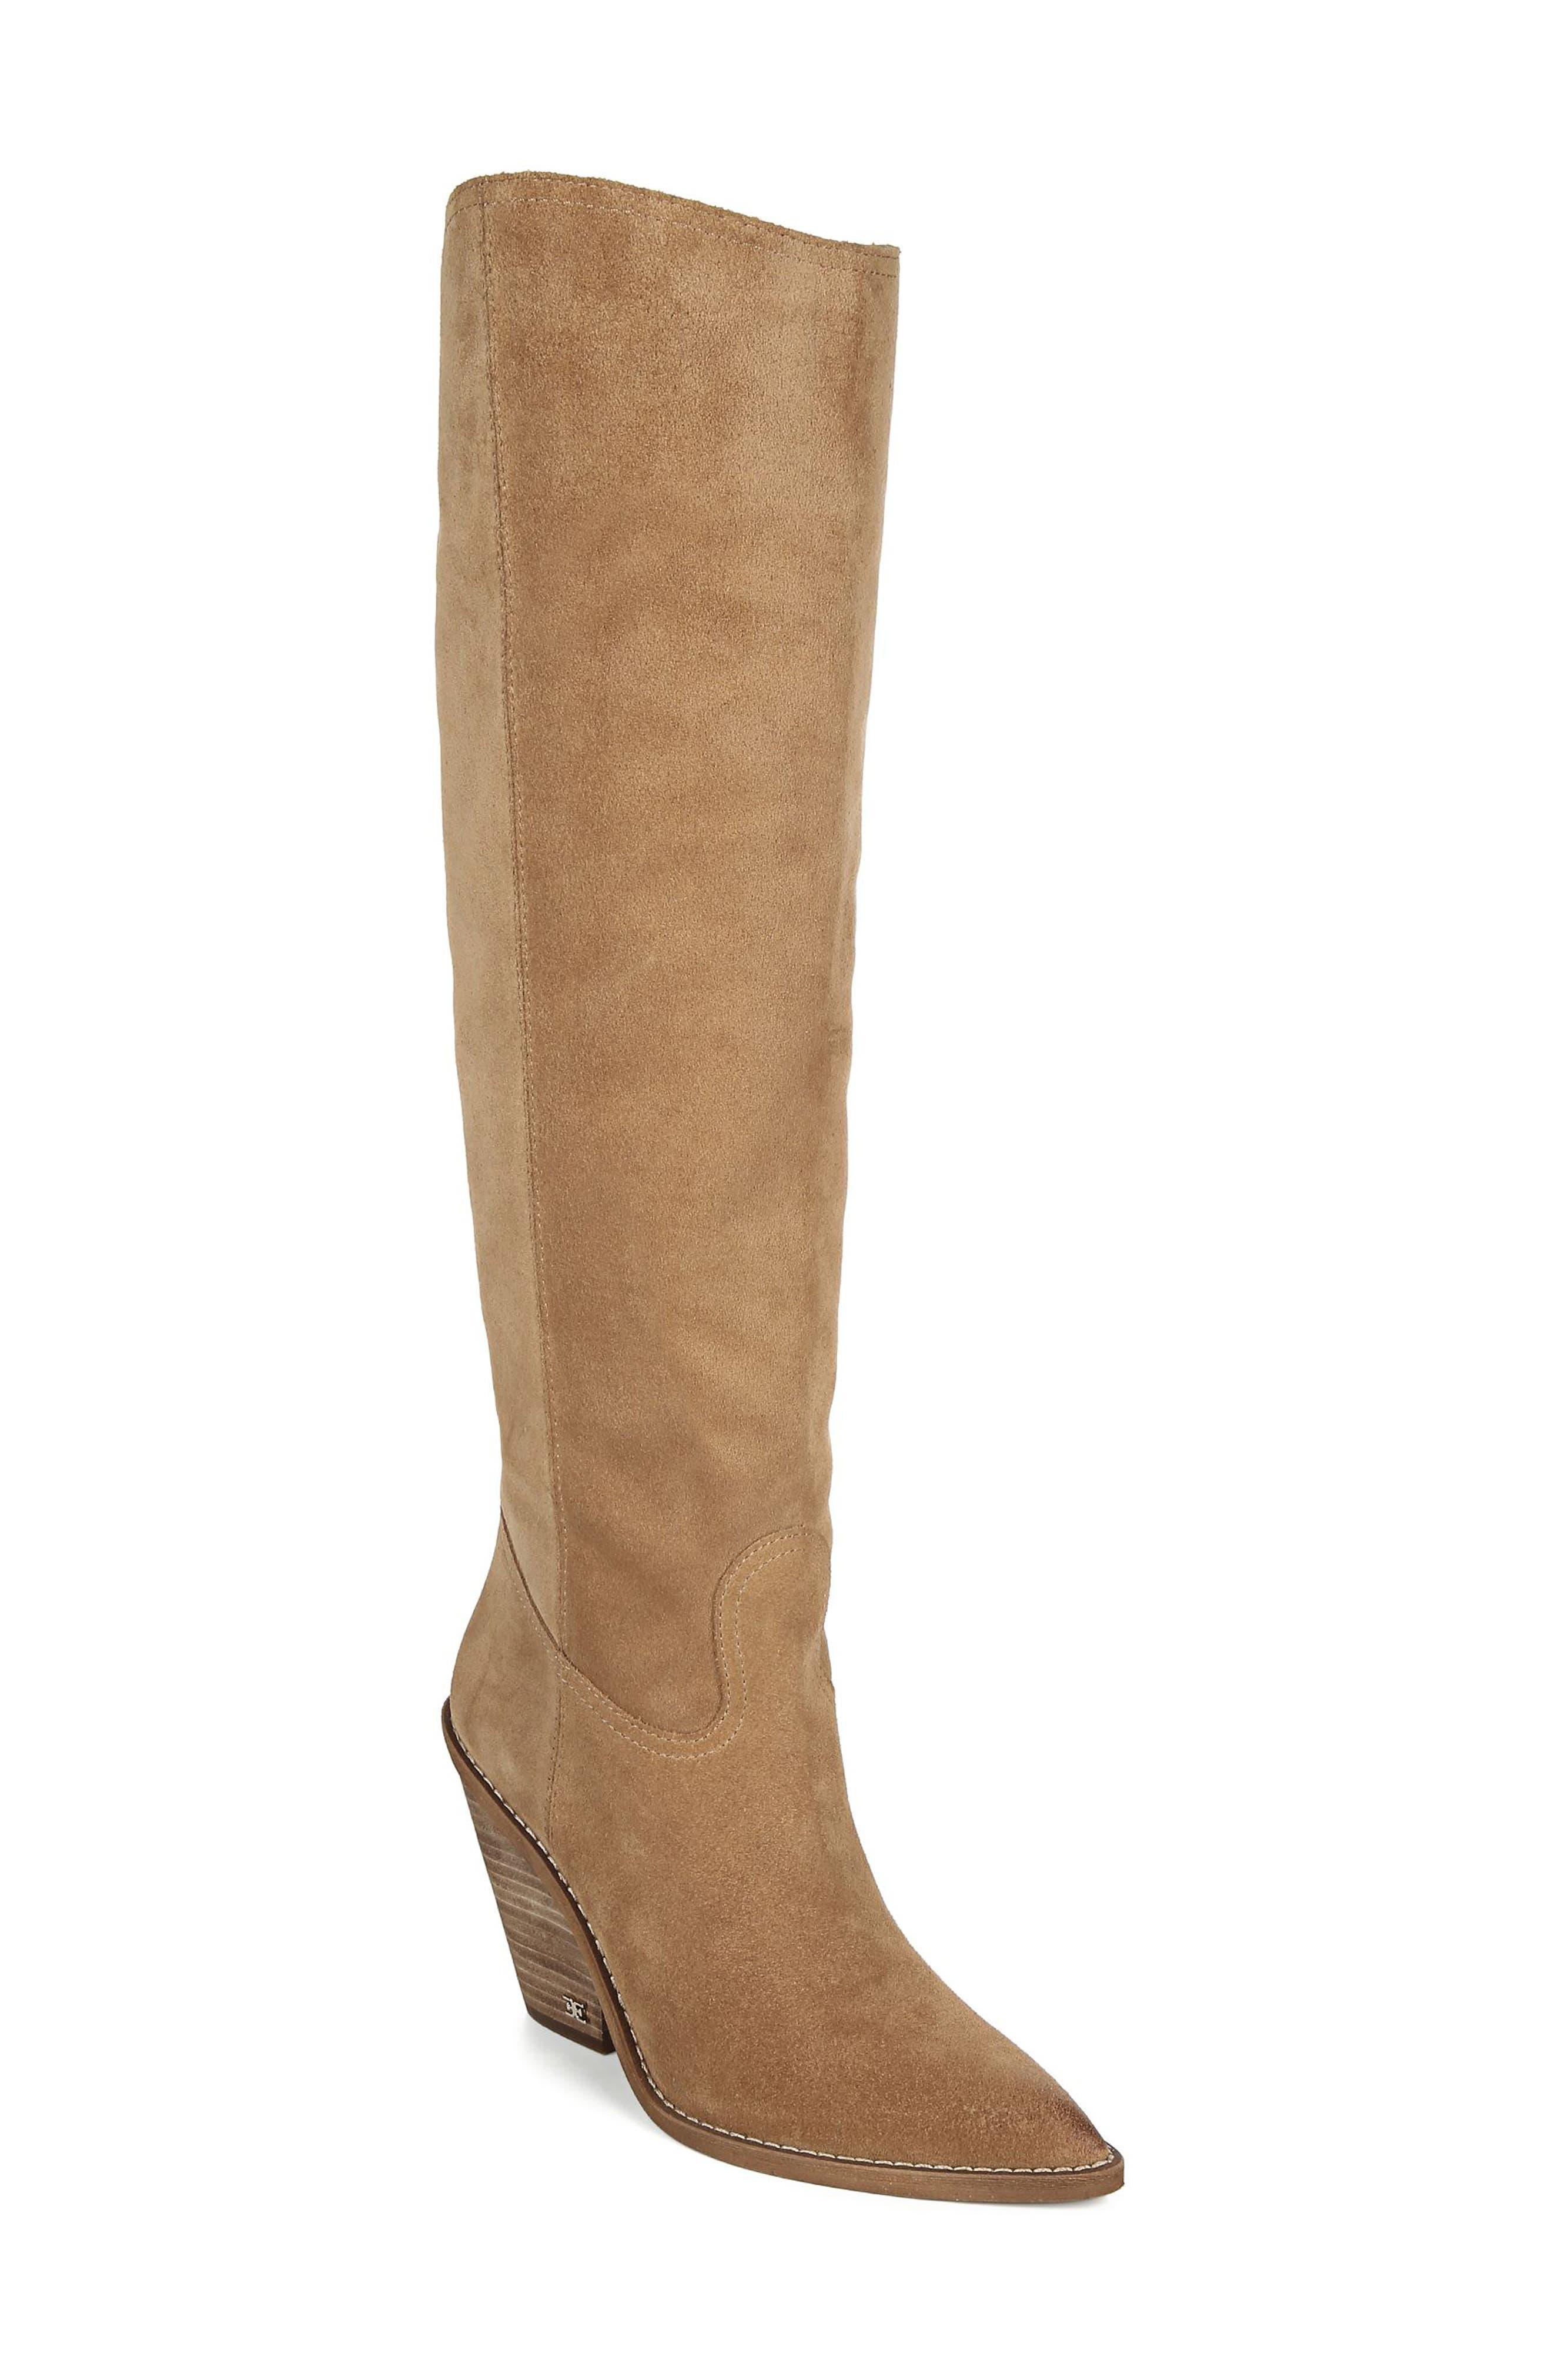 Sam Edelman Indigo Pointed Toe Knee High Boot (Women)